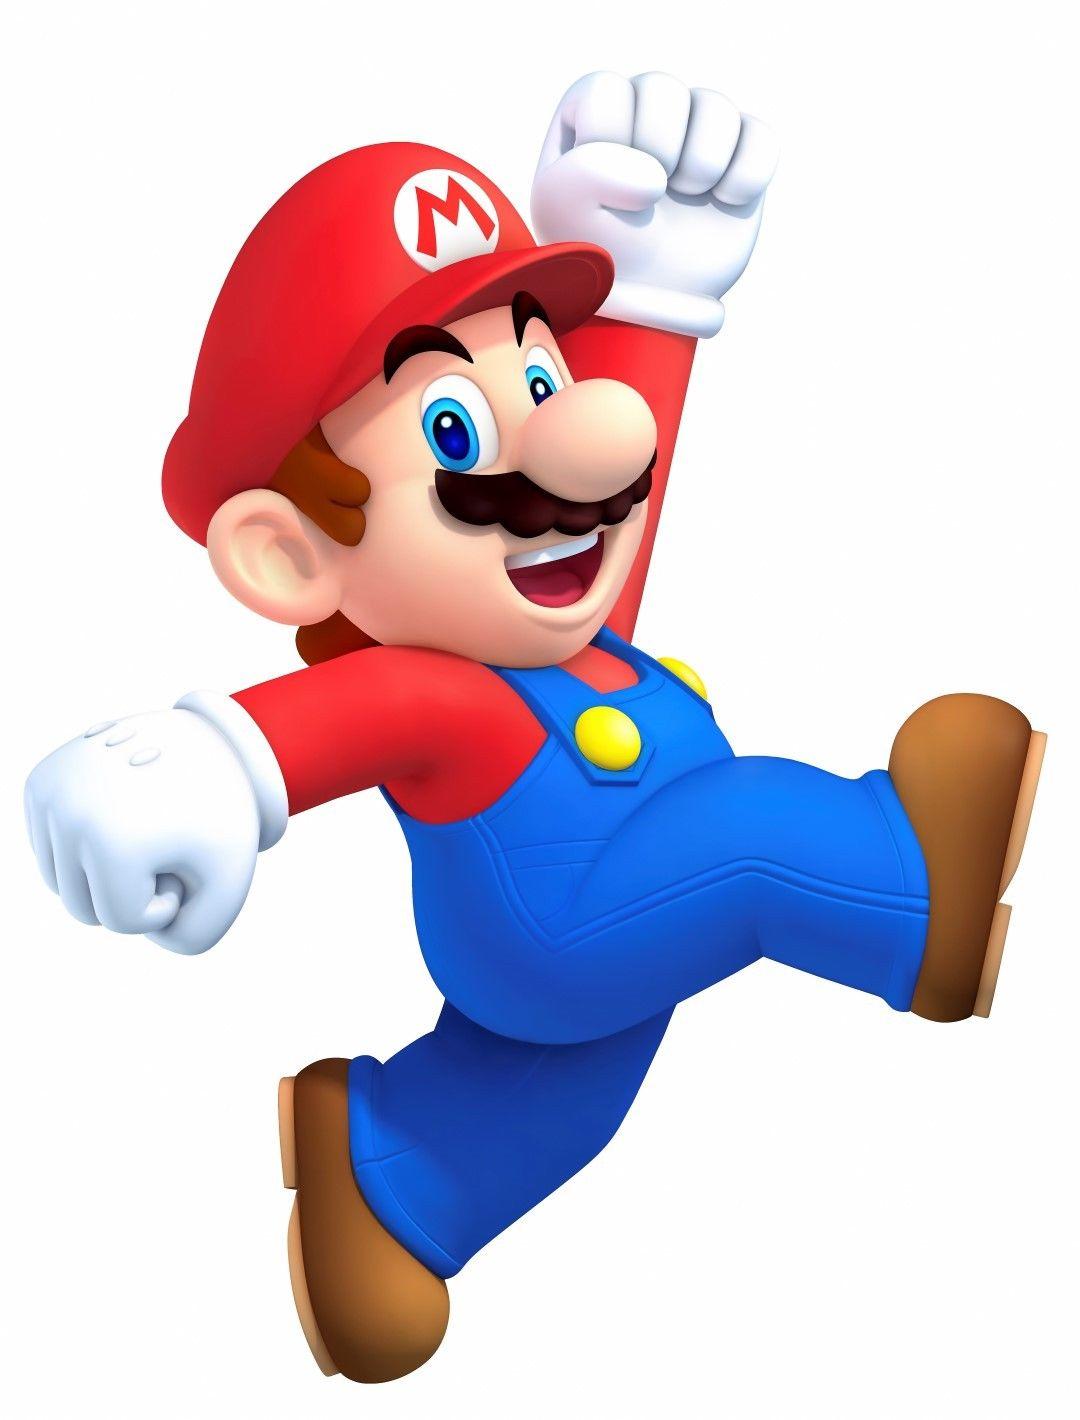 11 95 Aud Super Mario Jumping Character Video Game Decor Wall Art Print Premium Poster Ebay Home Garden Super Mario Run Mario Bros Super Mario